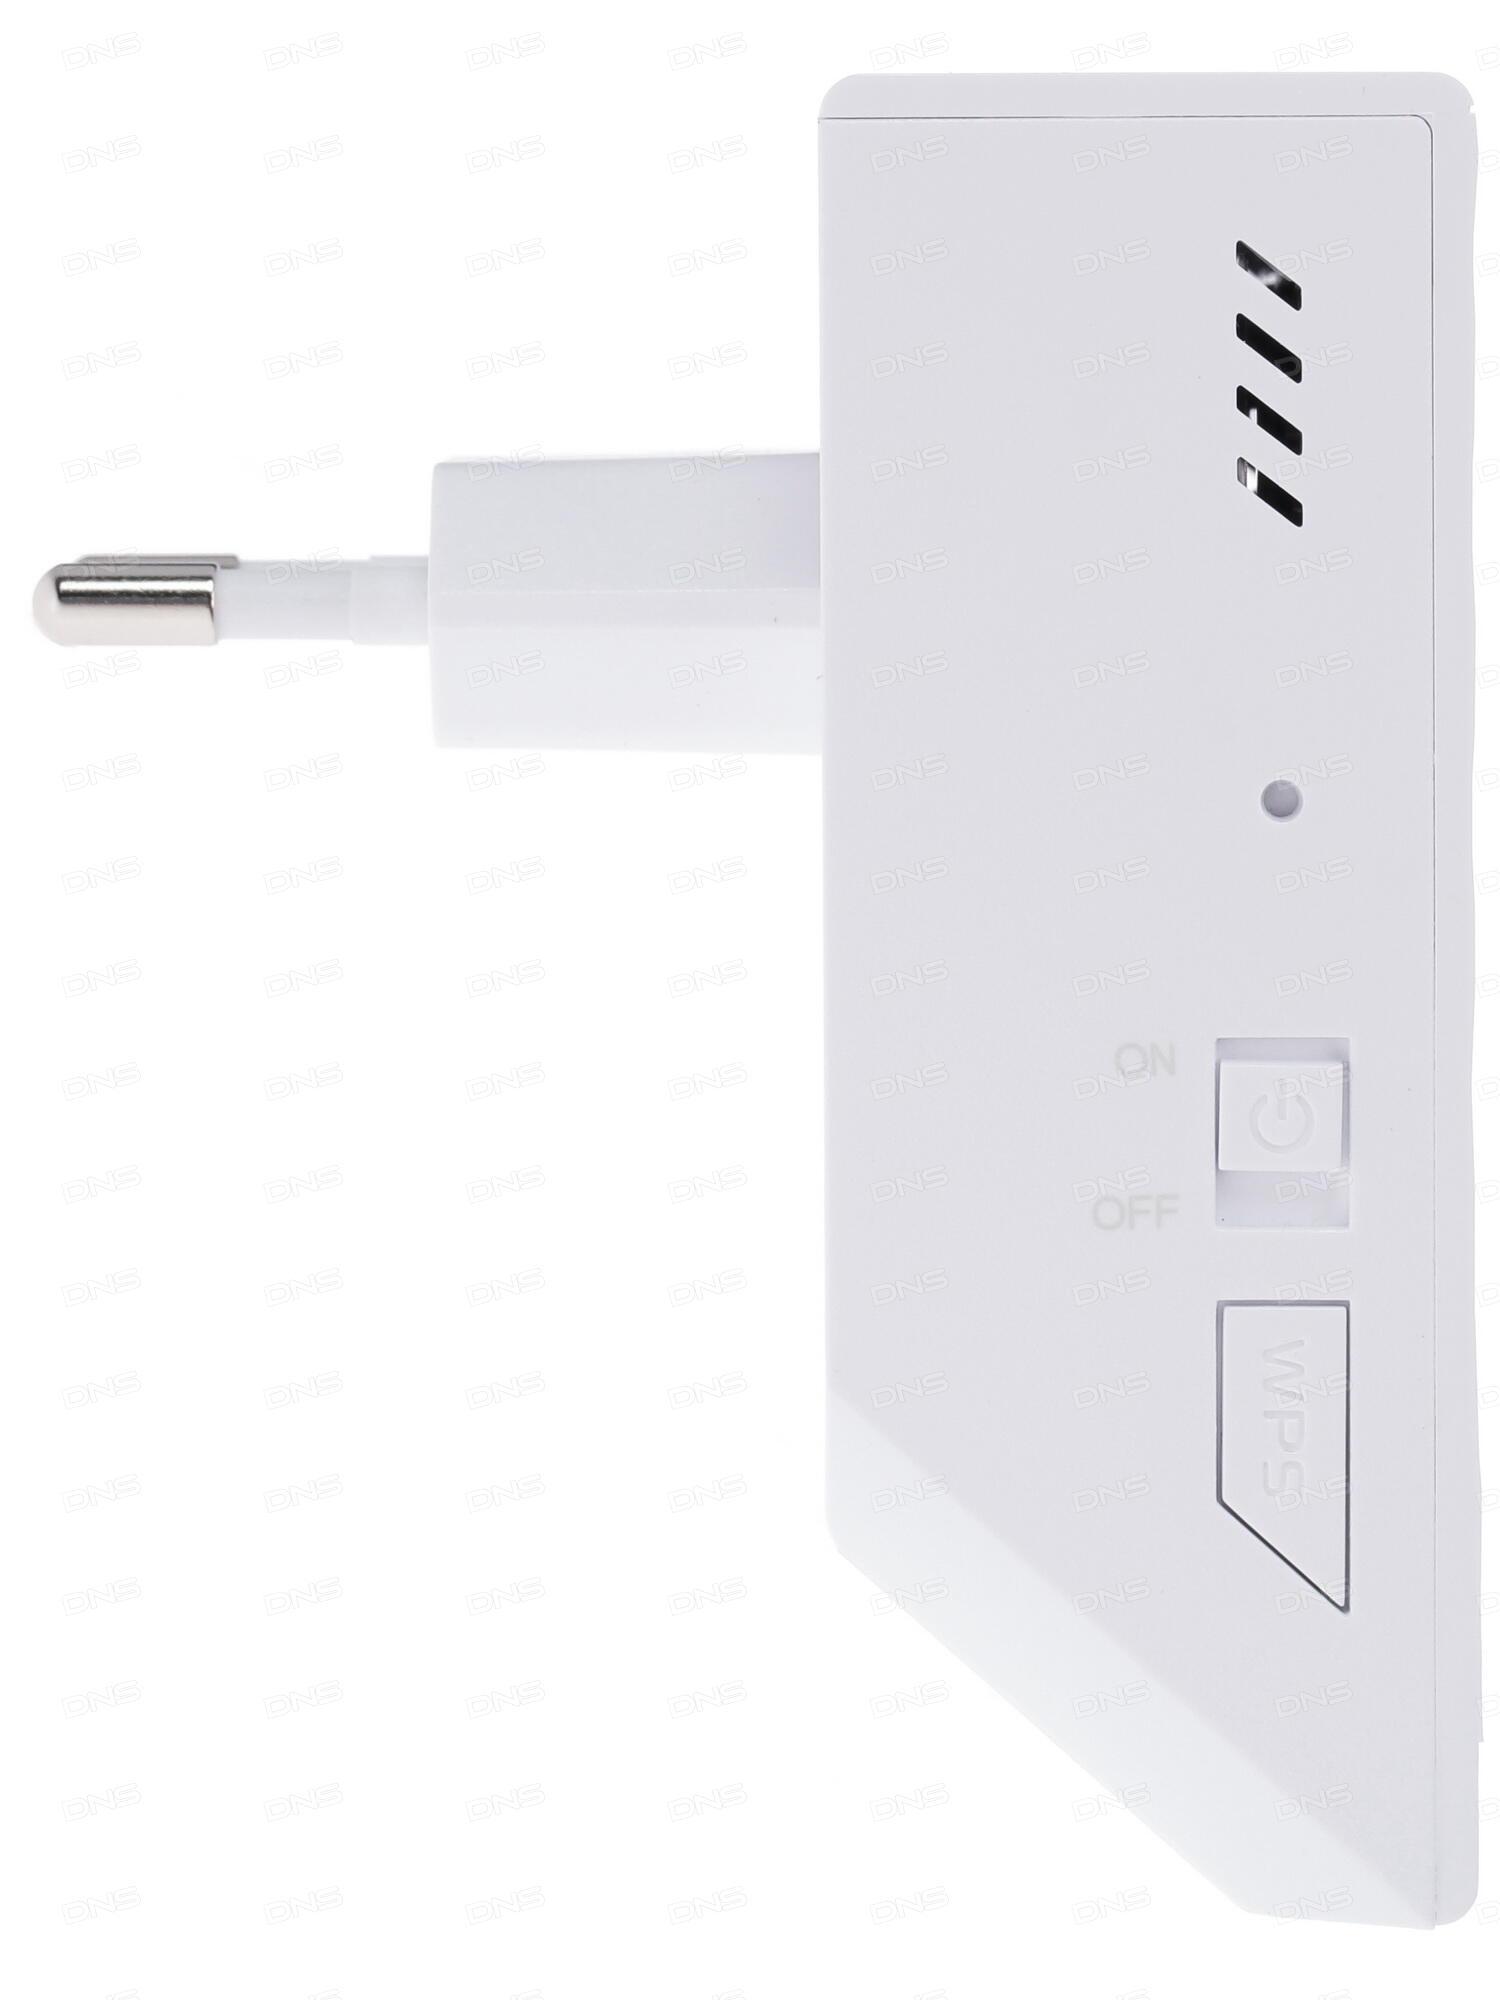 Интернетмагазин WiFi оборудования ТехноТрейд Сетевое Wi